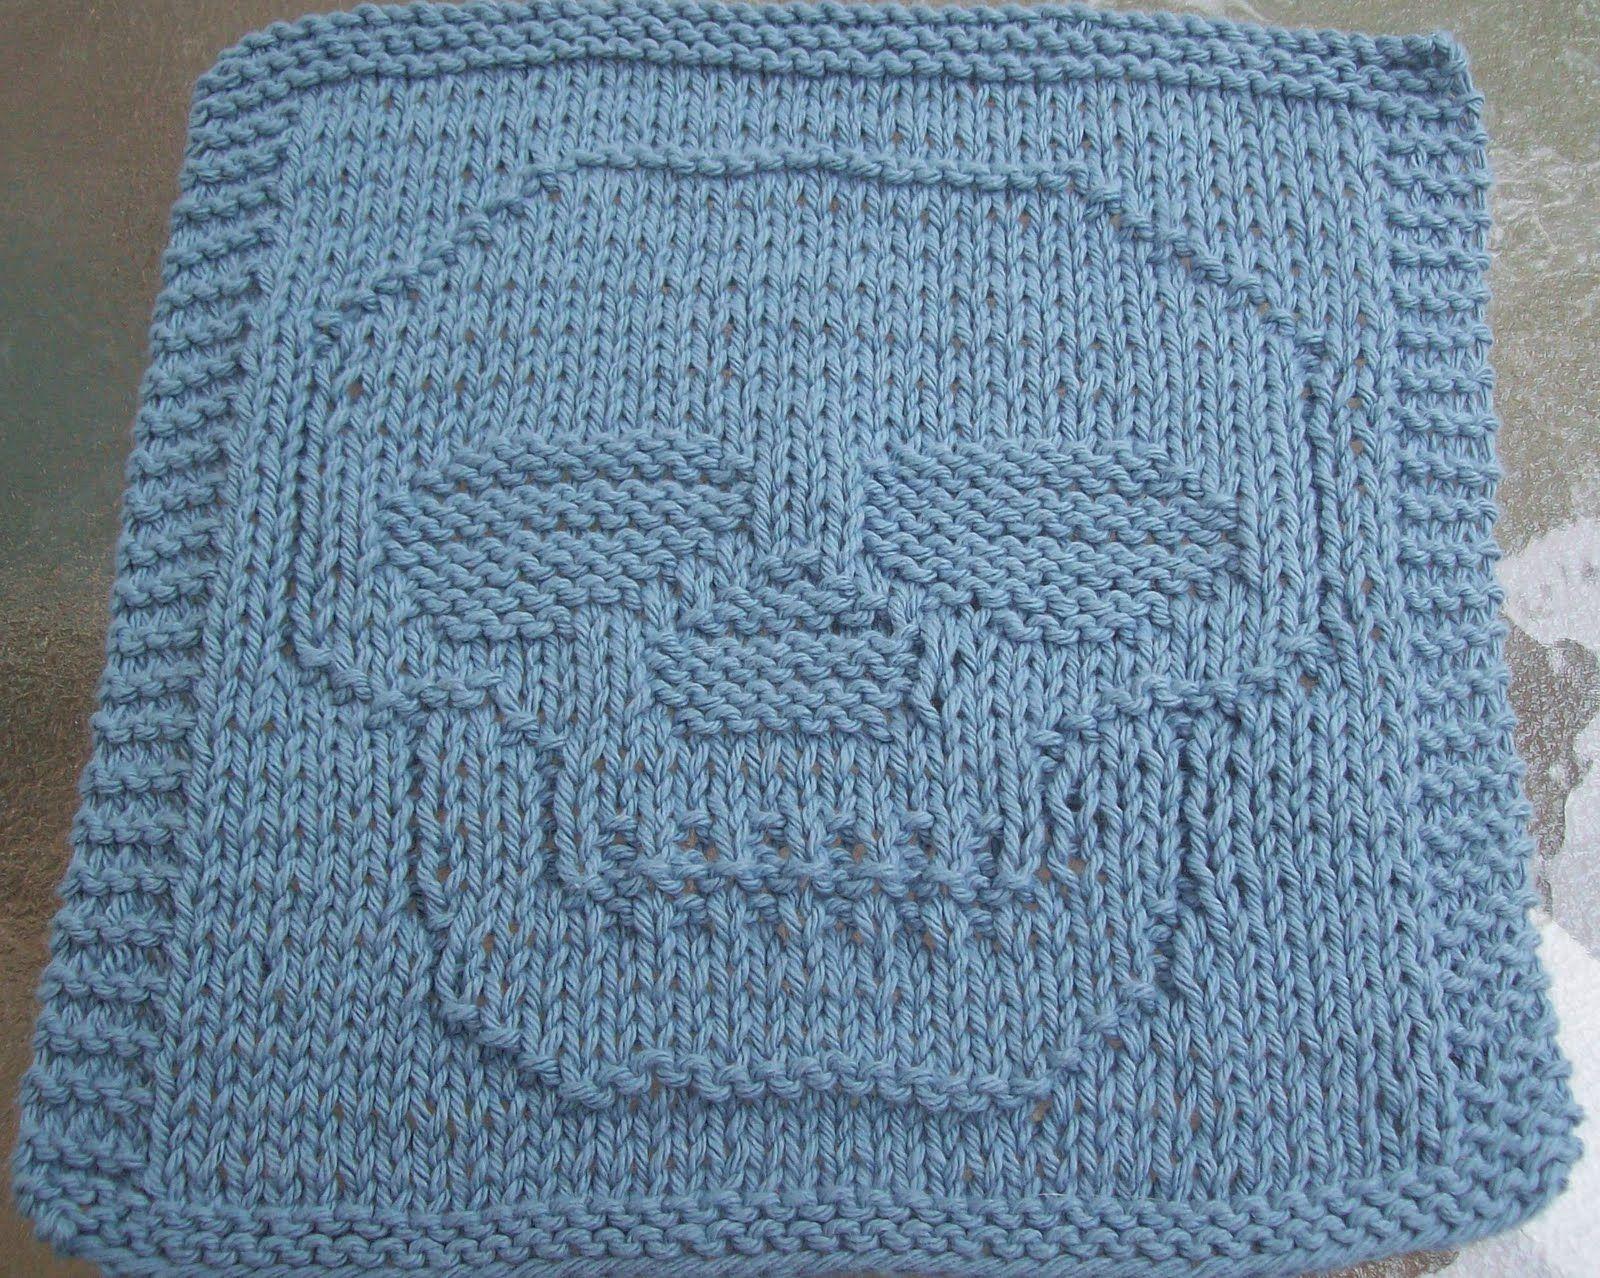 Knitted Dishcloth Patterns | Just a Skull Knit Dishcloth Pattern ...